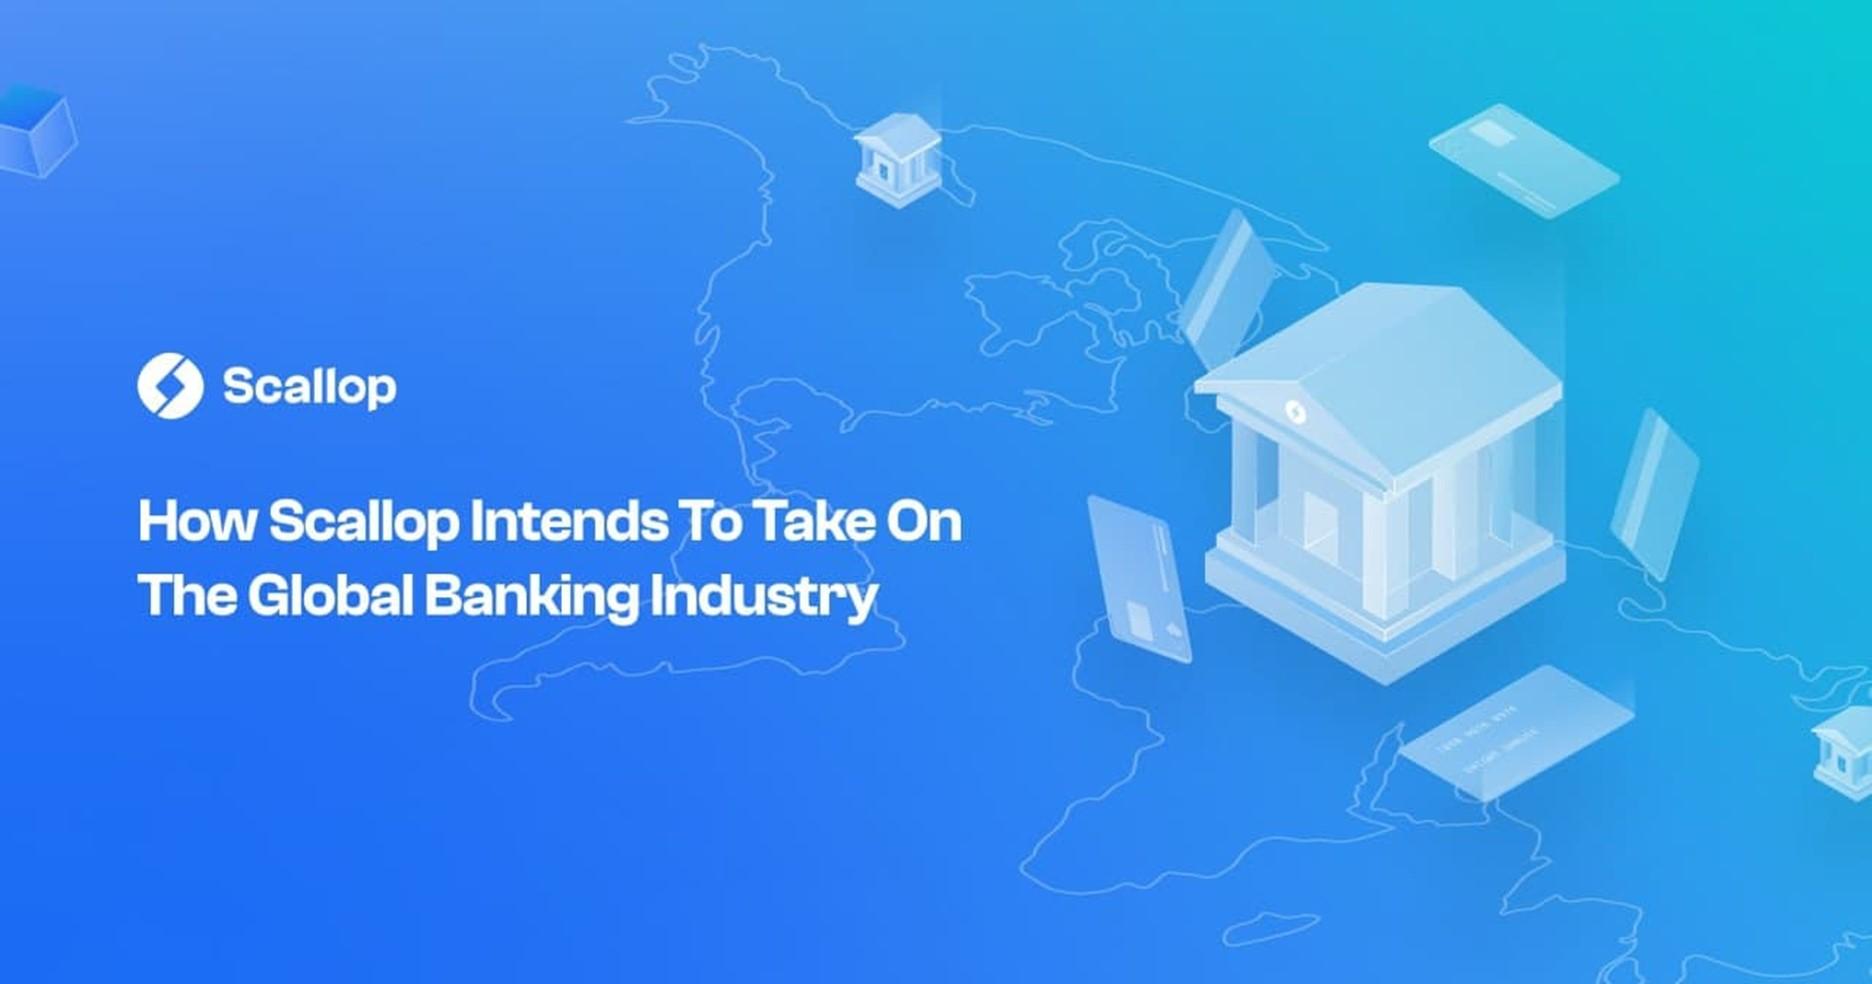 Cómo Scallop pretende enfrentarse a la industria bancaria global